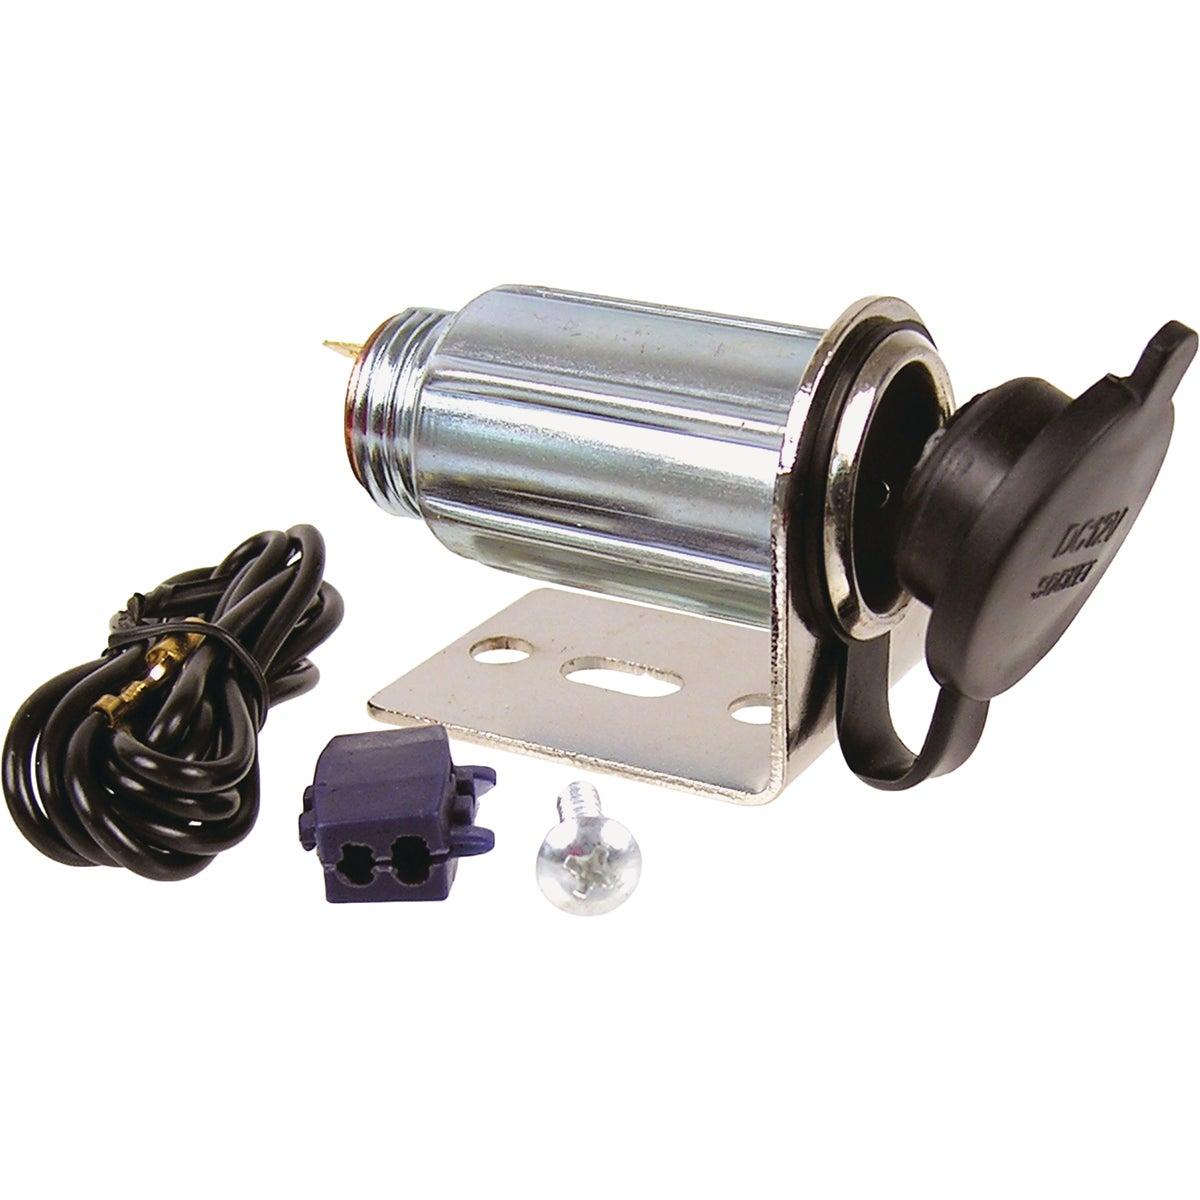 ACCESSORY POWER OUTLET - V5350 by Bell Automotive Prod